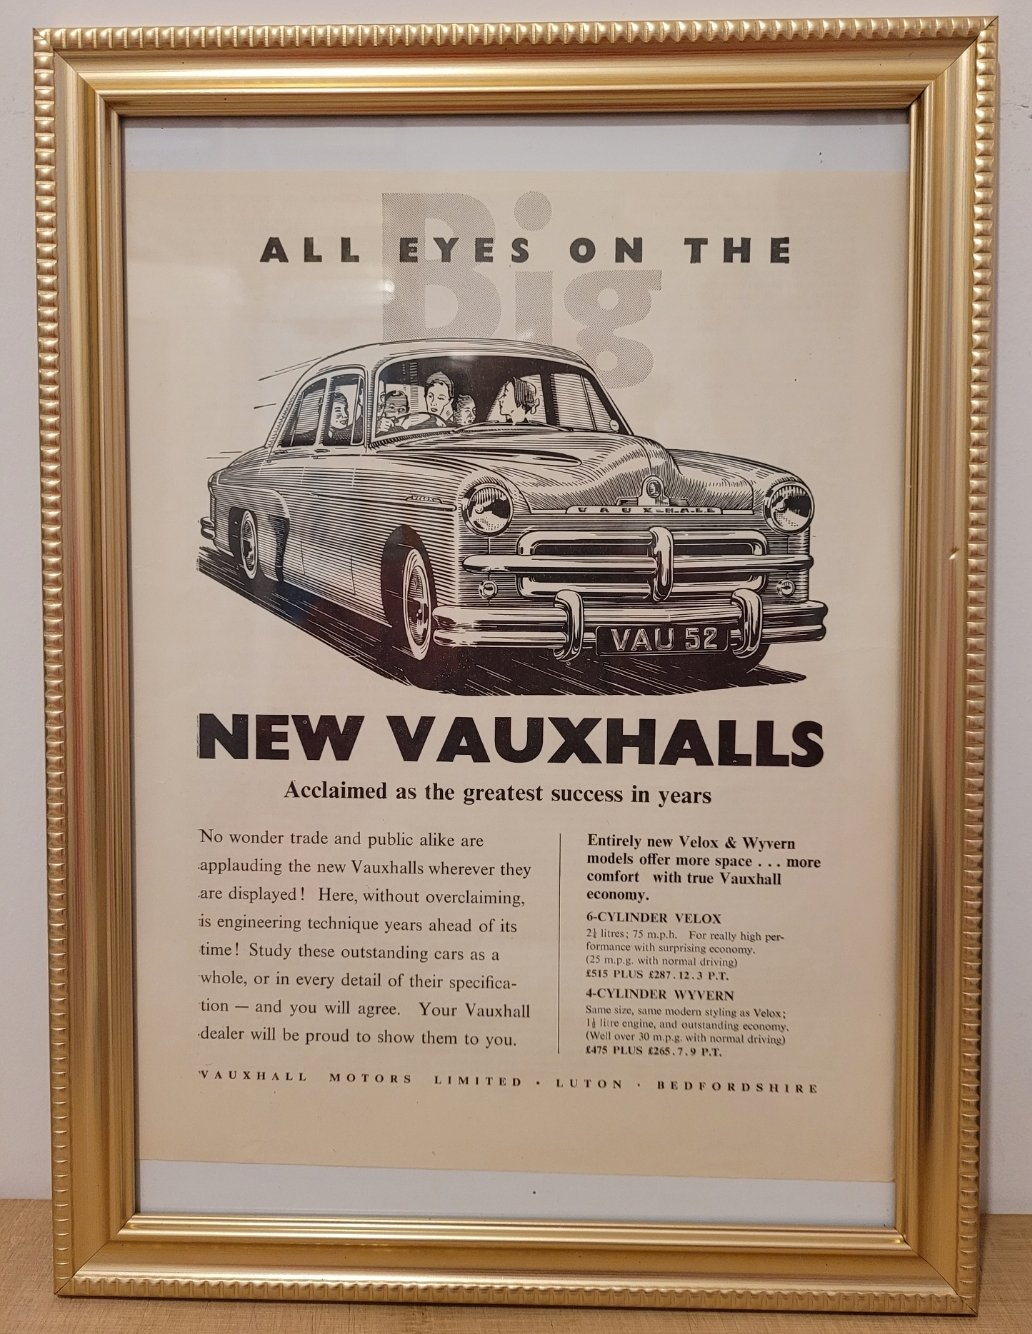 Original 1951 Vauxhall Velox Framed Advert